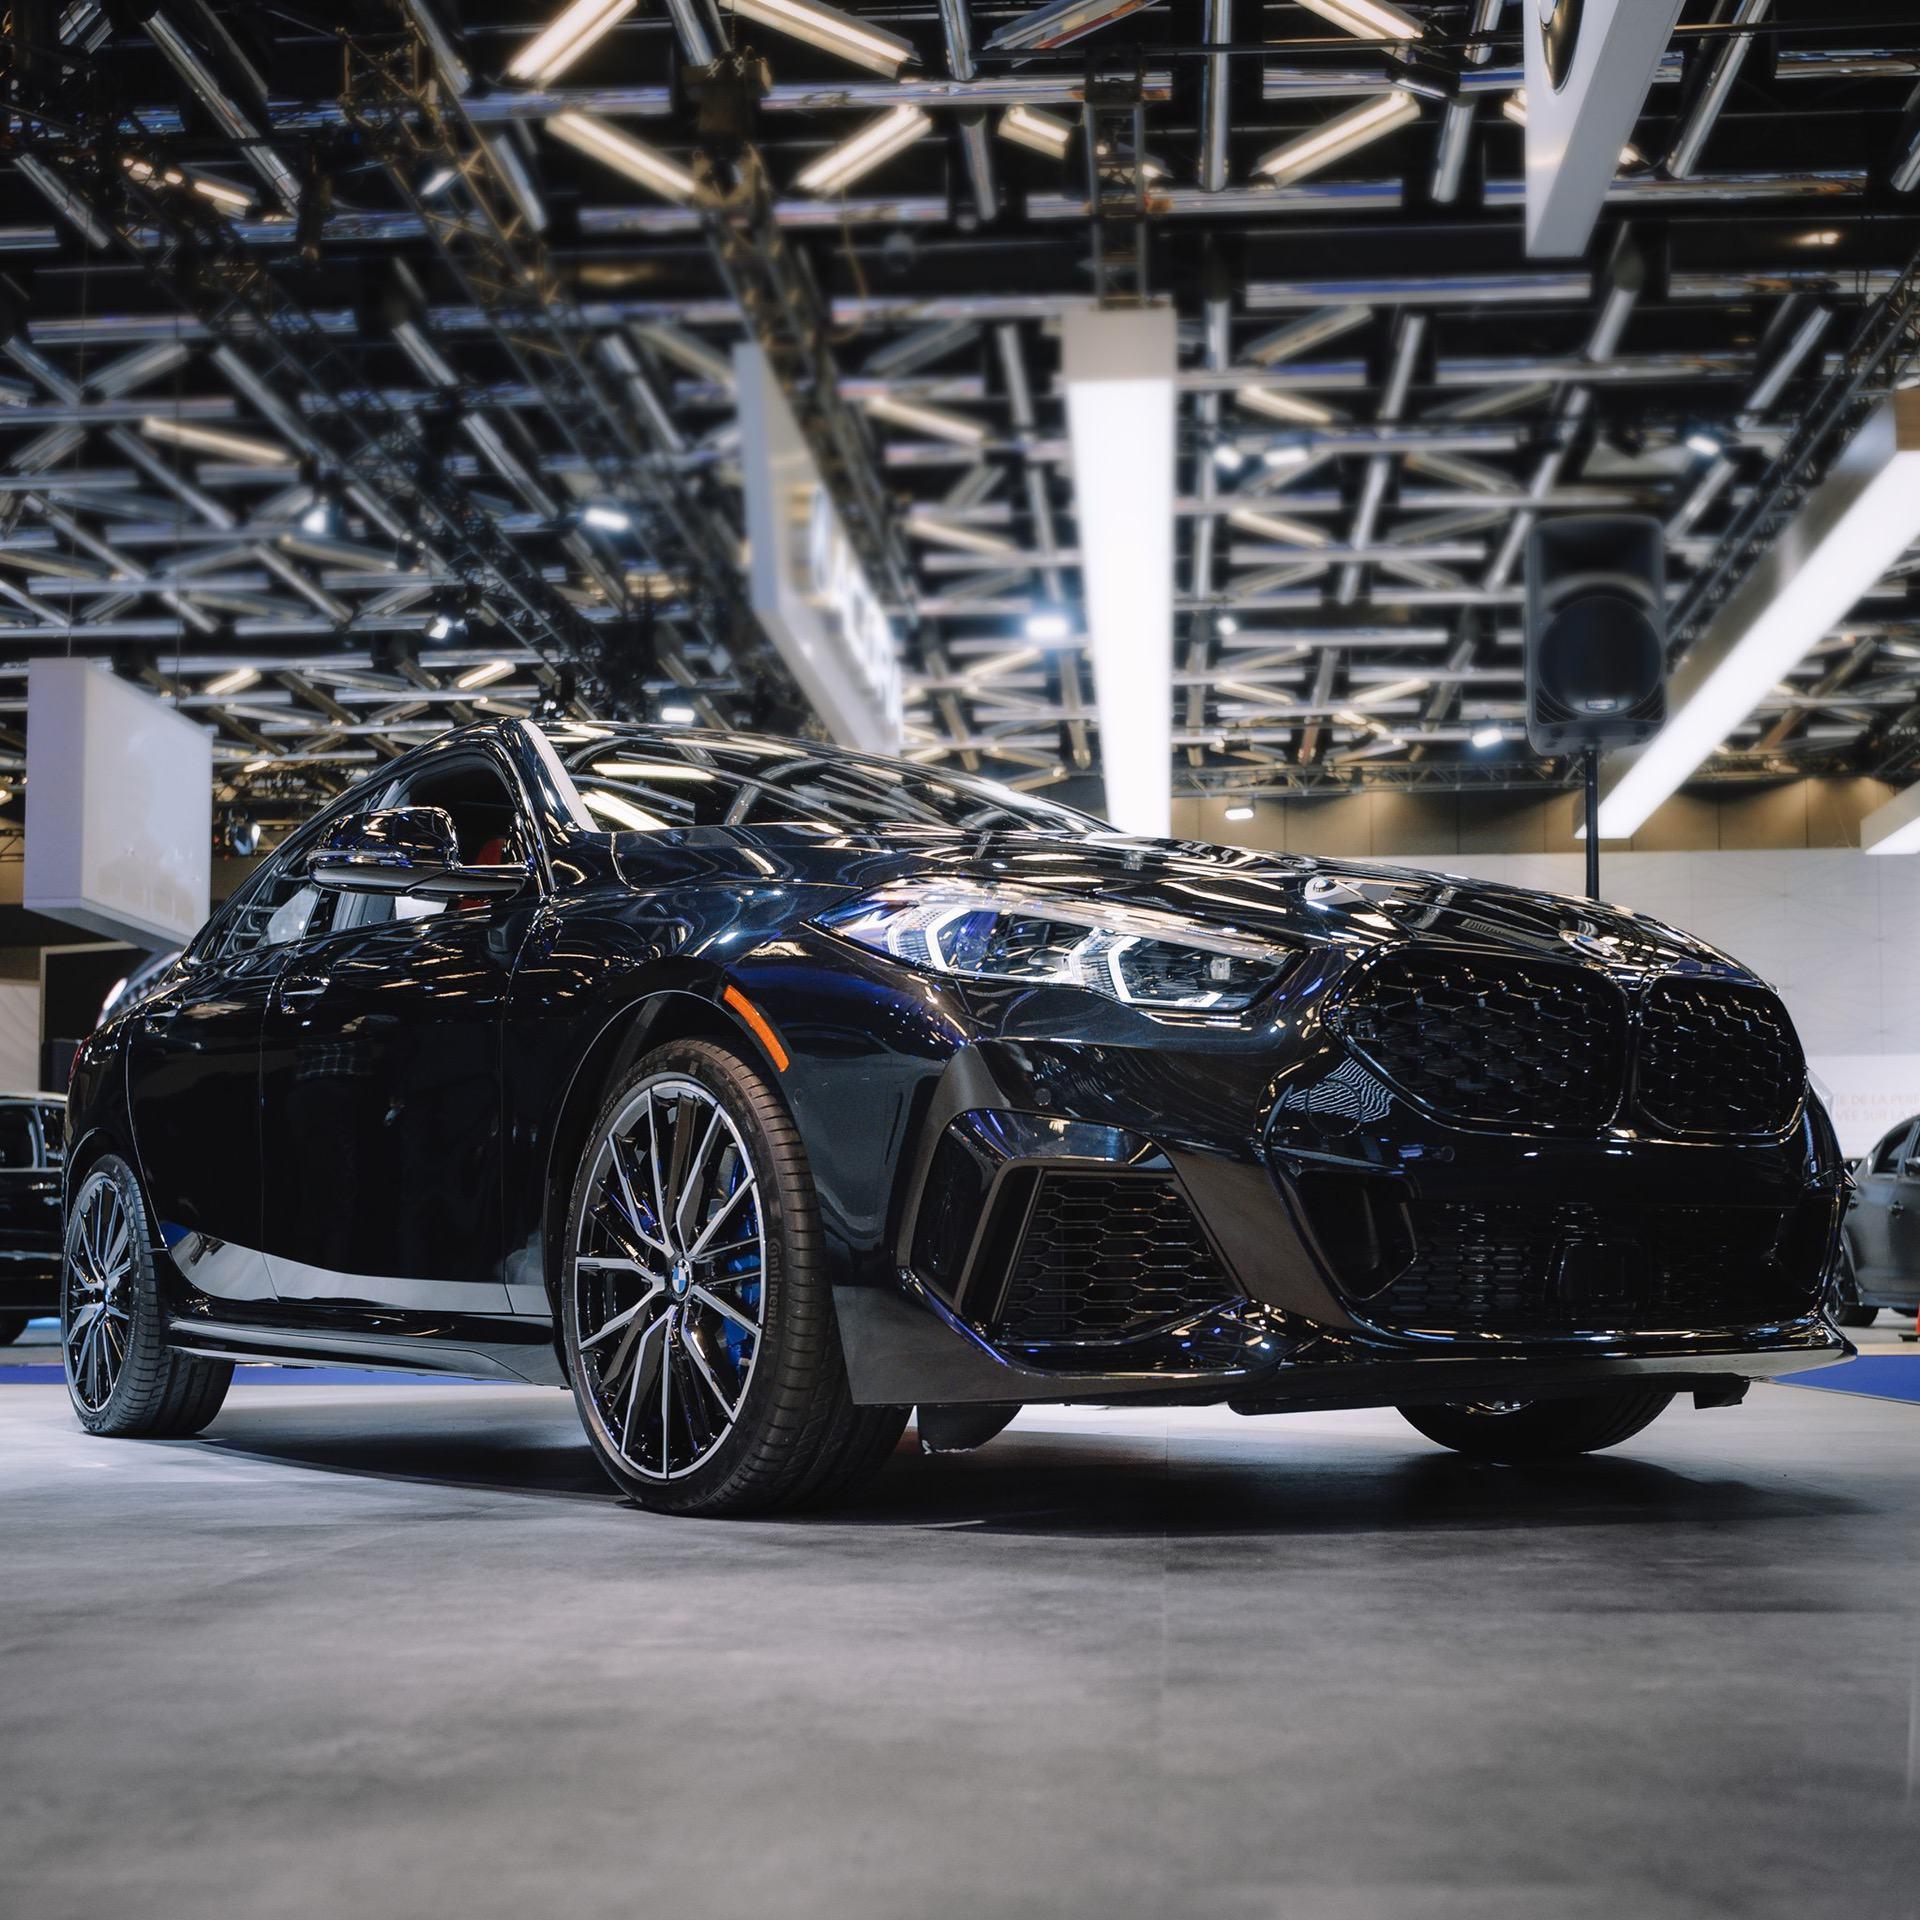 BMW 2 Series Gran Coupe In Sapphire Black Looks Pretty Good